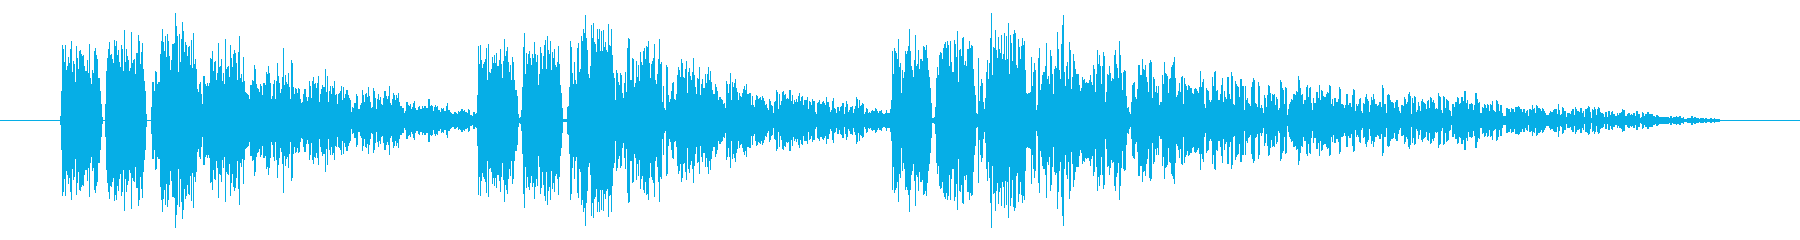 SNES-RPG05-16(倒す)の再生済みの波形